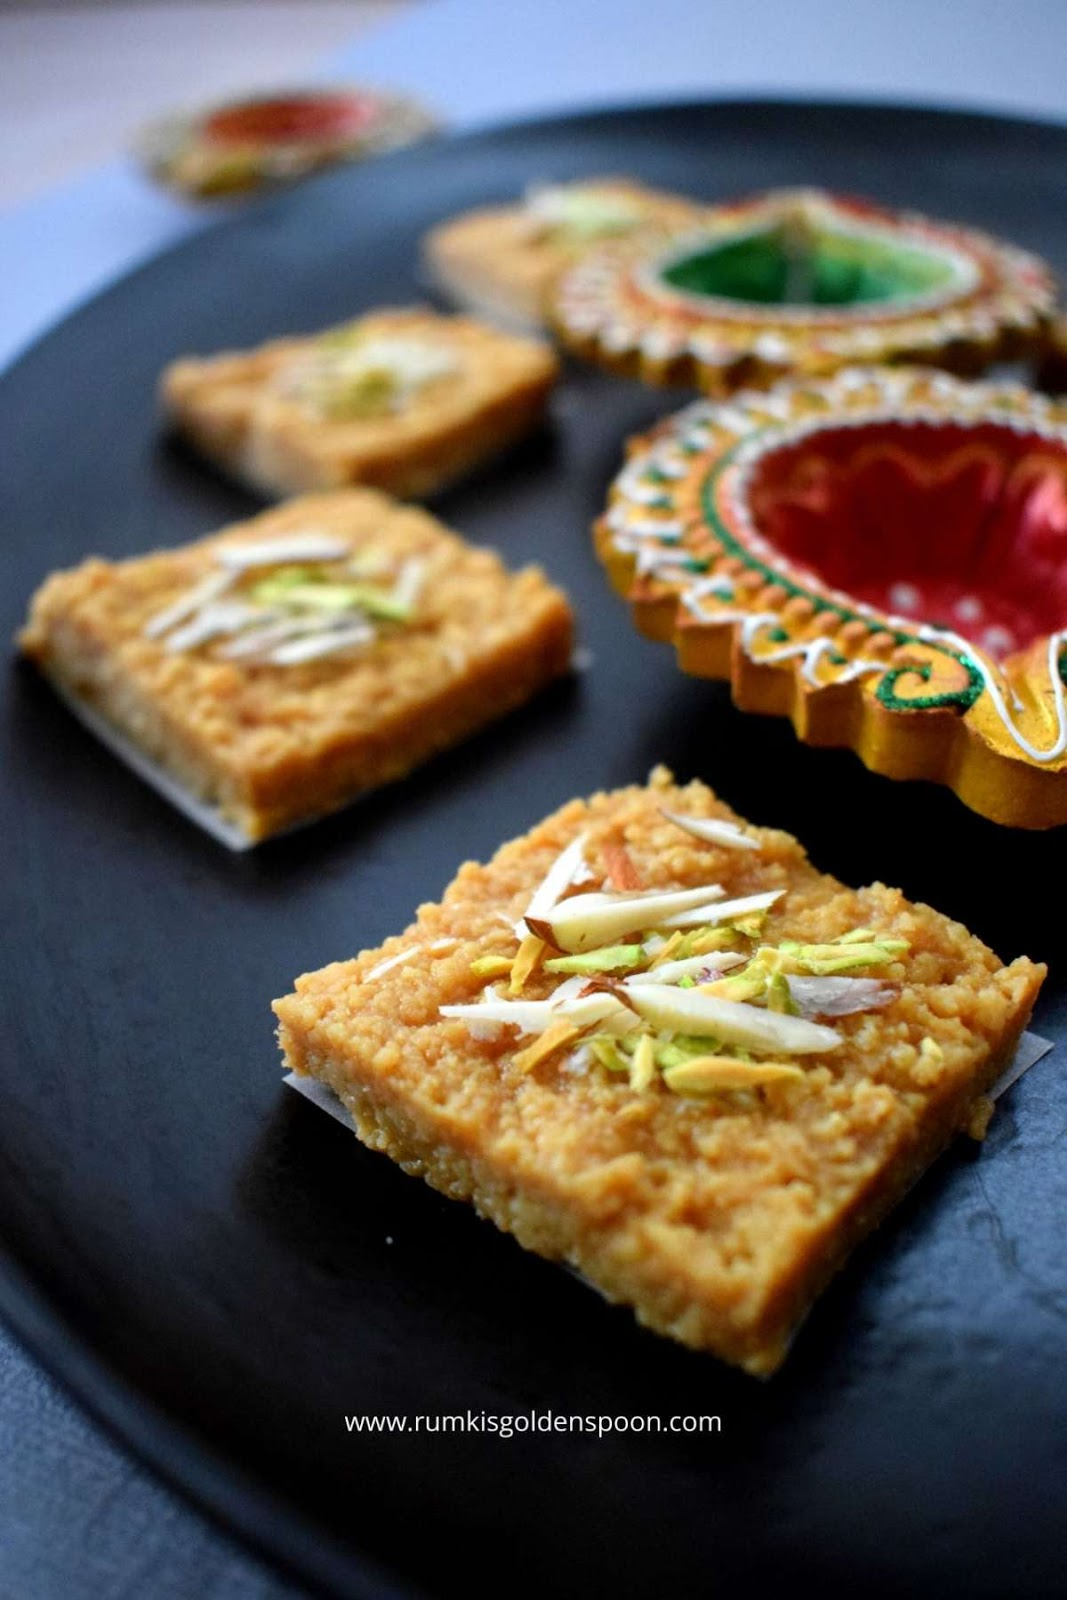 Kalakand, kalakand recipe, recipe for kalakand, how to make kalakand, indian sweet recipe, indian dessert recipes, kalakand mithai, Kalakand barfi, indian milk cake recipe, easy indian dessert recipes for dinner parties, instant indian dessert recipes, indian sweet recipes, indian sweets recipes, indian sweet recipes for Diwali, jaggery sweet recipes, sweet recipes with jaggery, patali gur recipes, jaggery sweet, sweets with jaggery, date palm jaggery recipes, nolen gur sweets, khajur gur recipes, winter sweet recipe, Gur Kalakand, jaggery Kalakand, Rumki's Golden Spoon